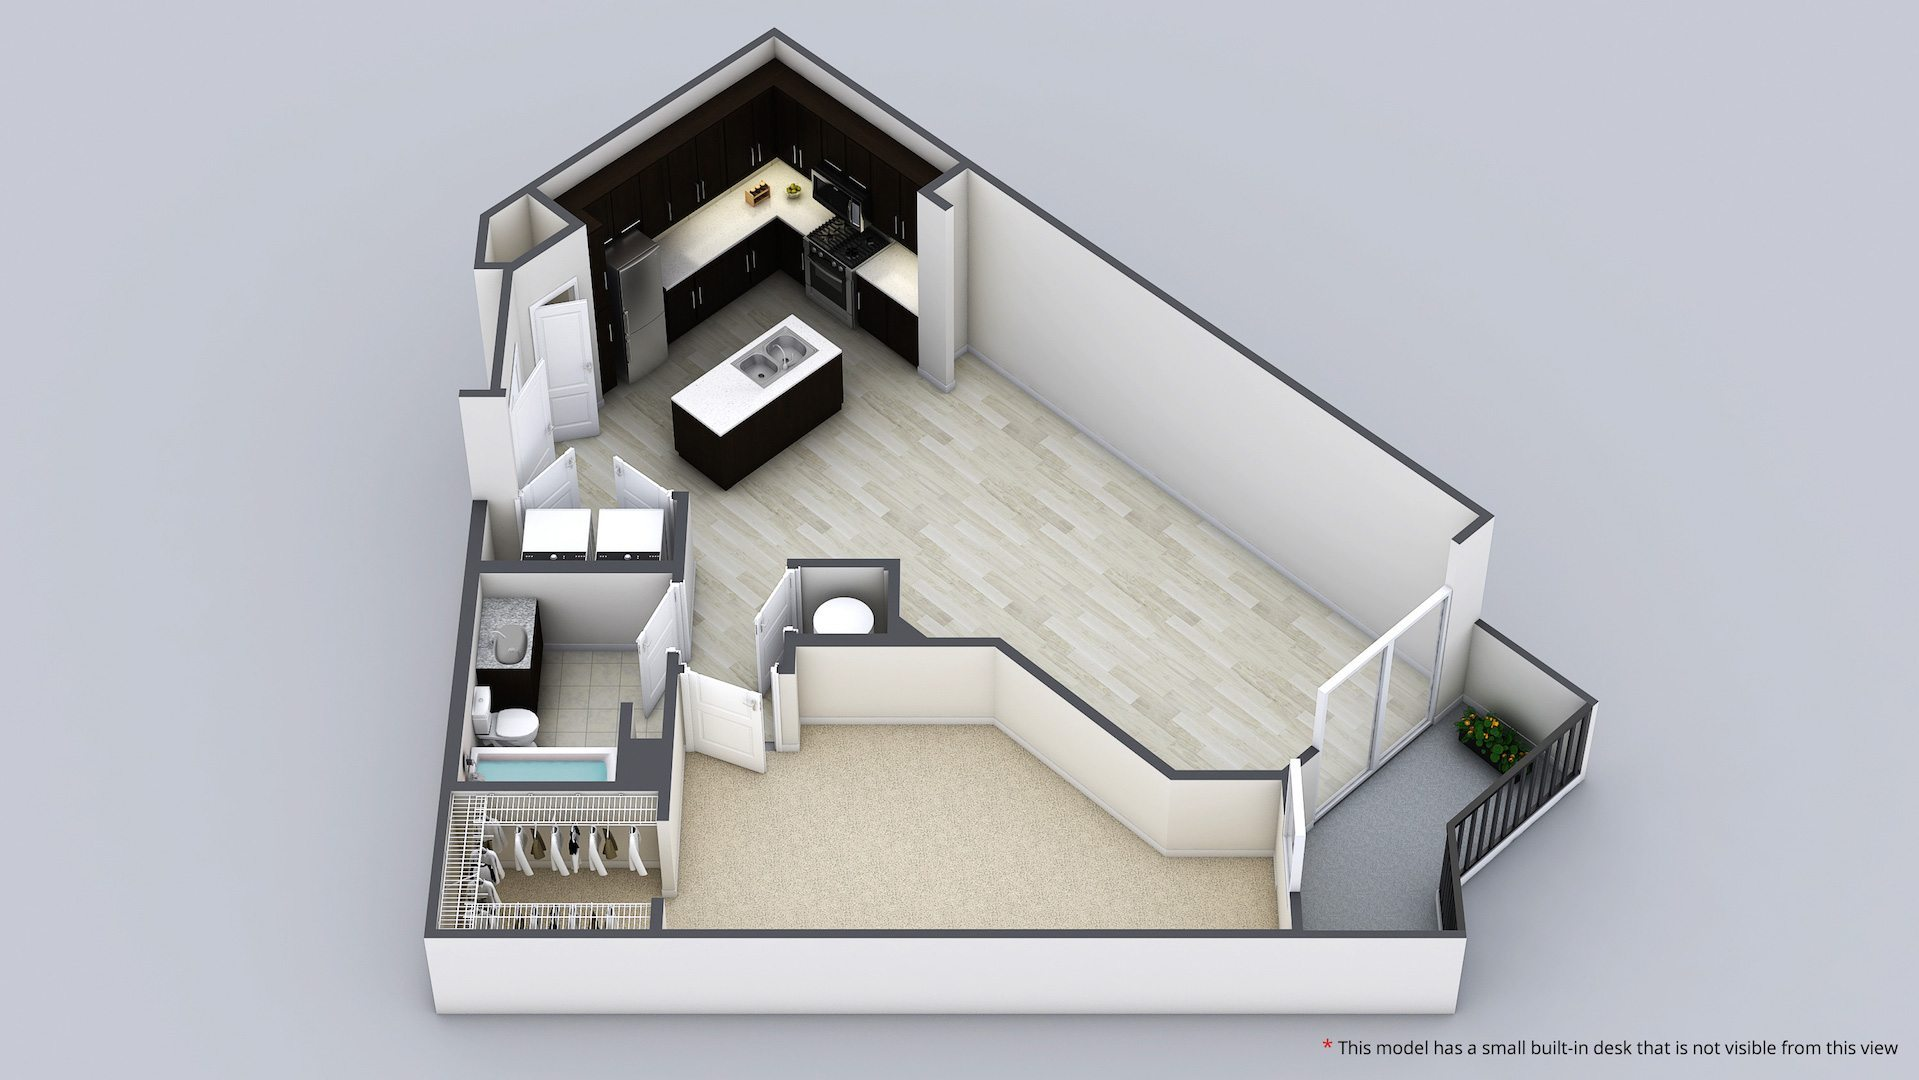 spacious orlando one bedroom apartment with walk in closet 103 s osceola ave orlando fl 32801 1 bedroom apartment